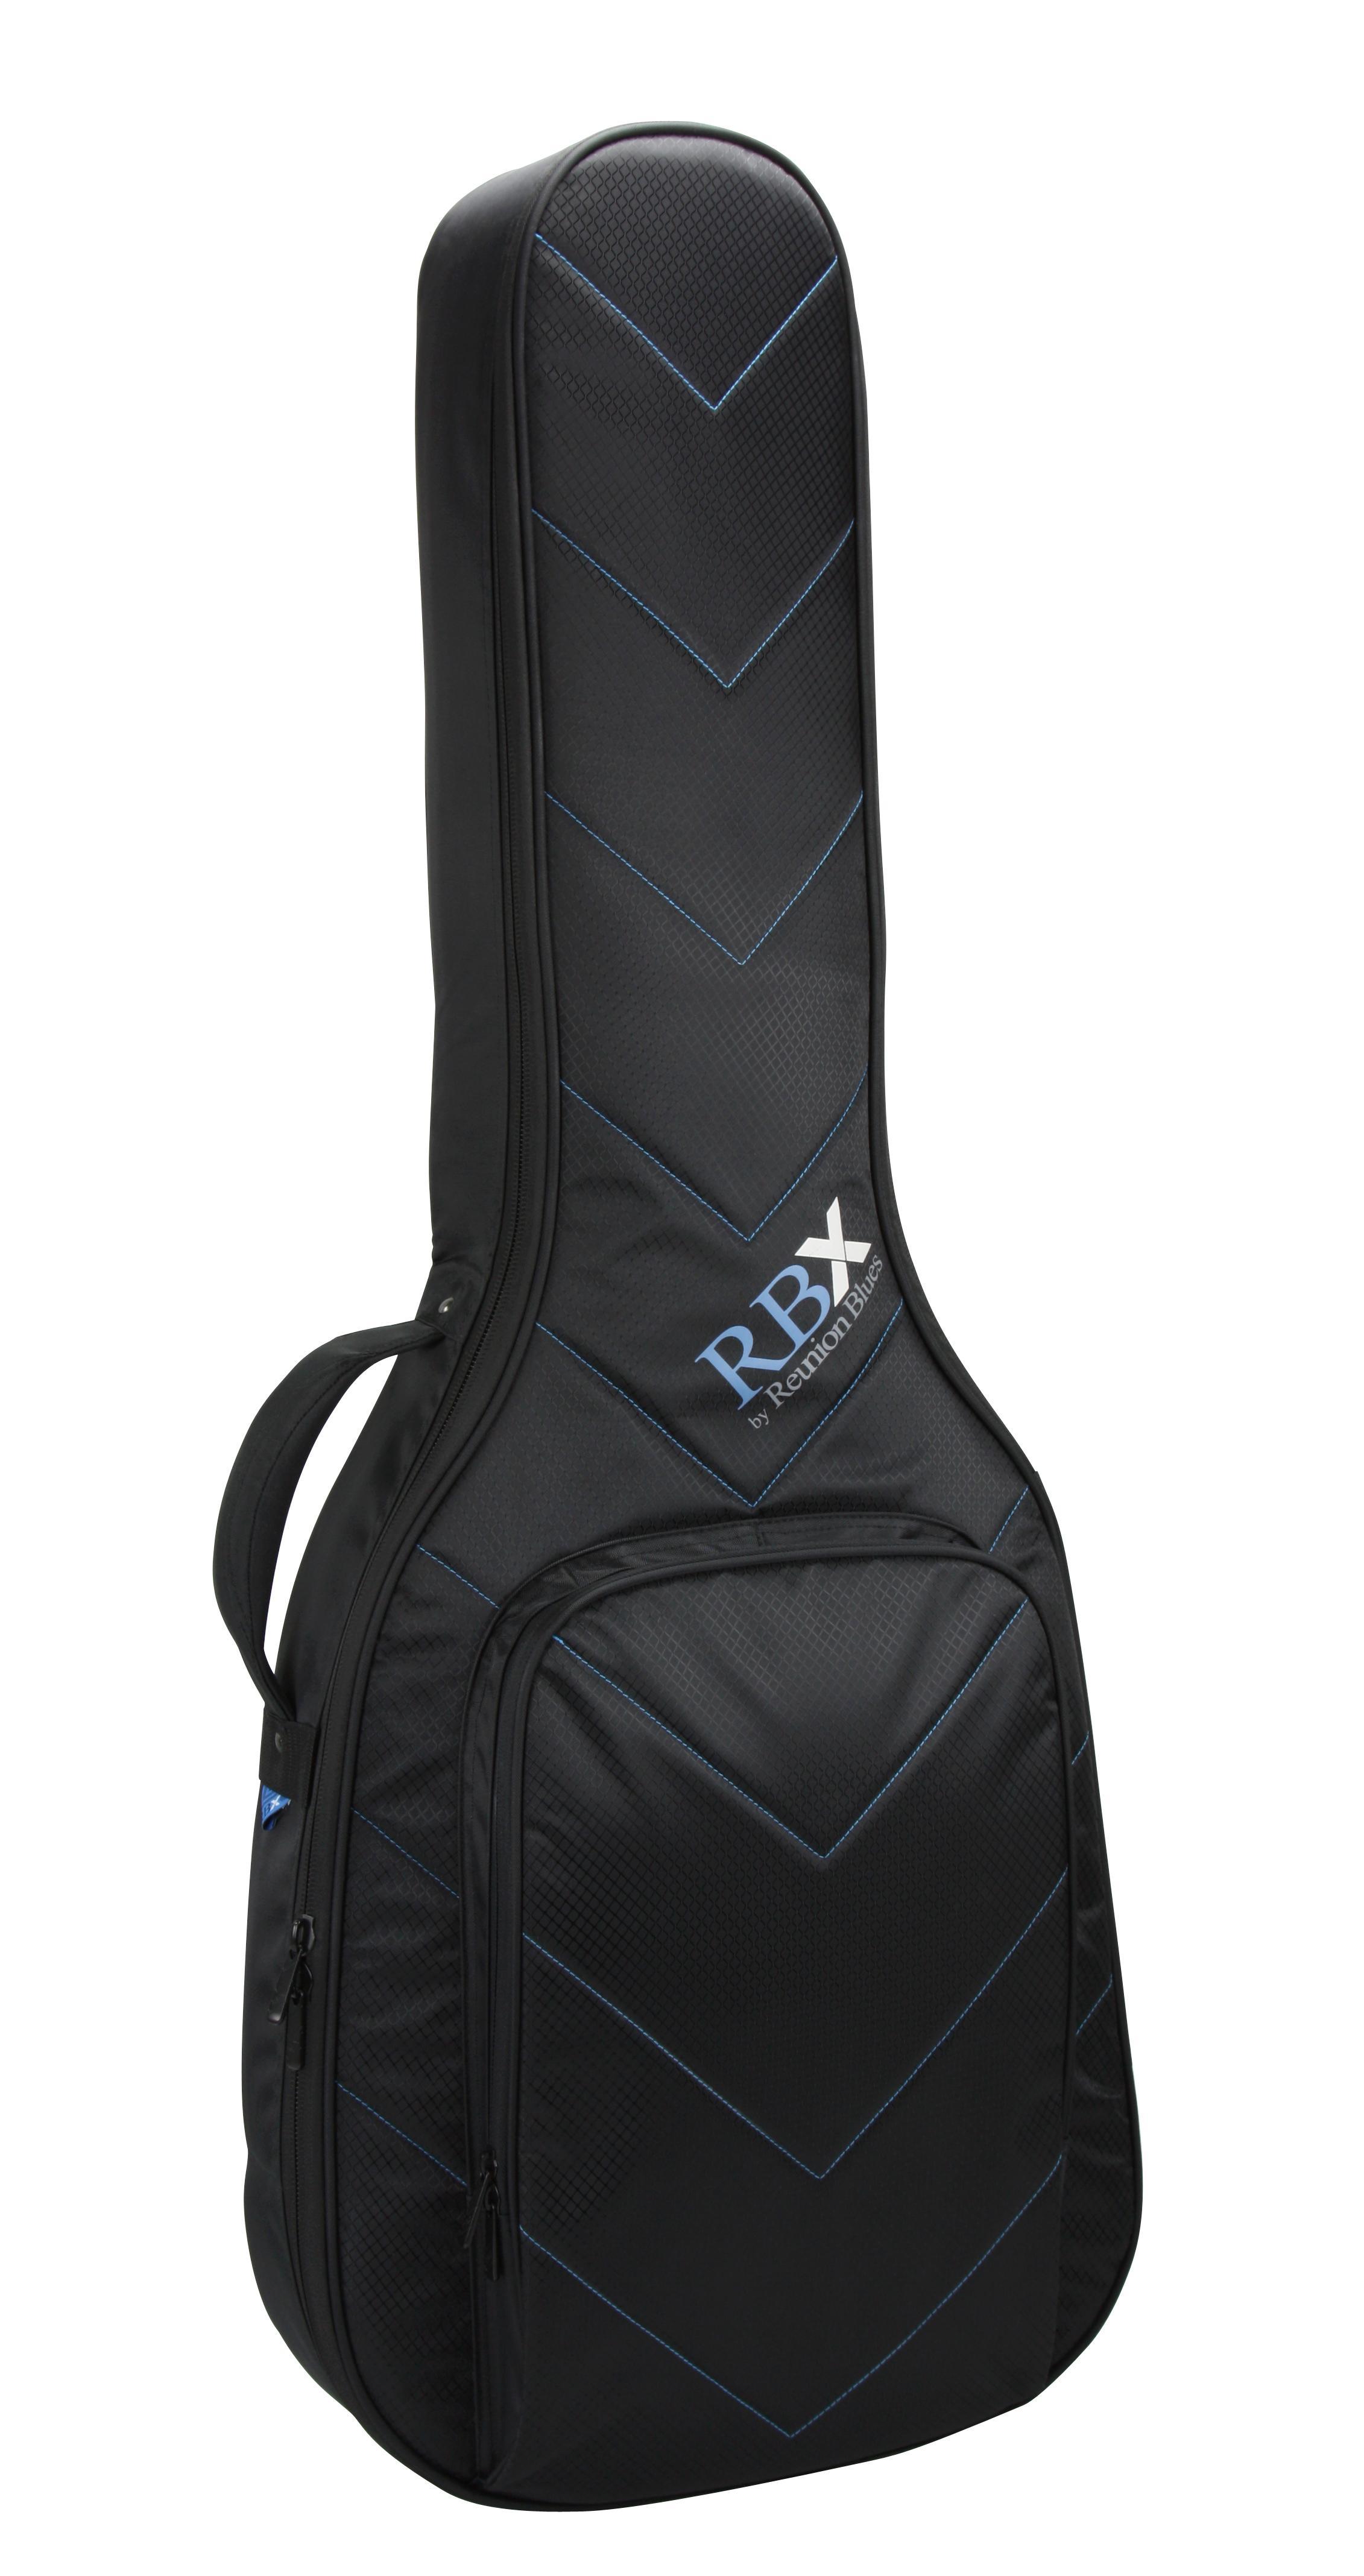 reunion blues rbx335 semi hollow electric guitar bag musical instruments. Black Bedroom Furniture Sets. Home Design Ideas